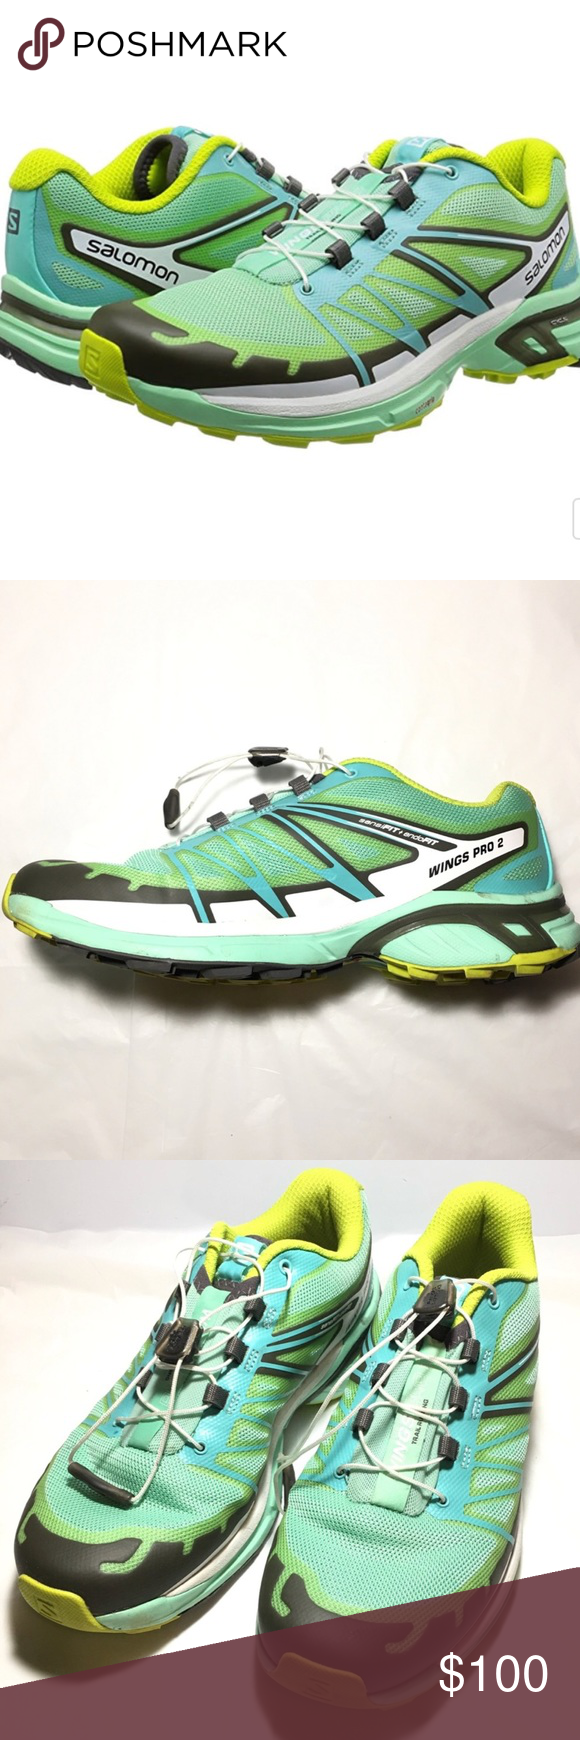 243b2756a714 MAKE OFFERS Salomon Tennis Shoes Size 8